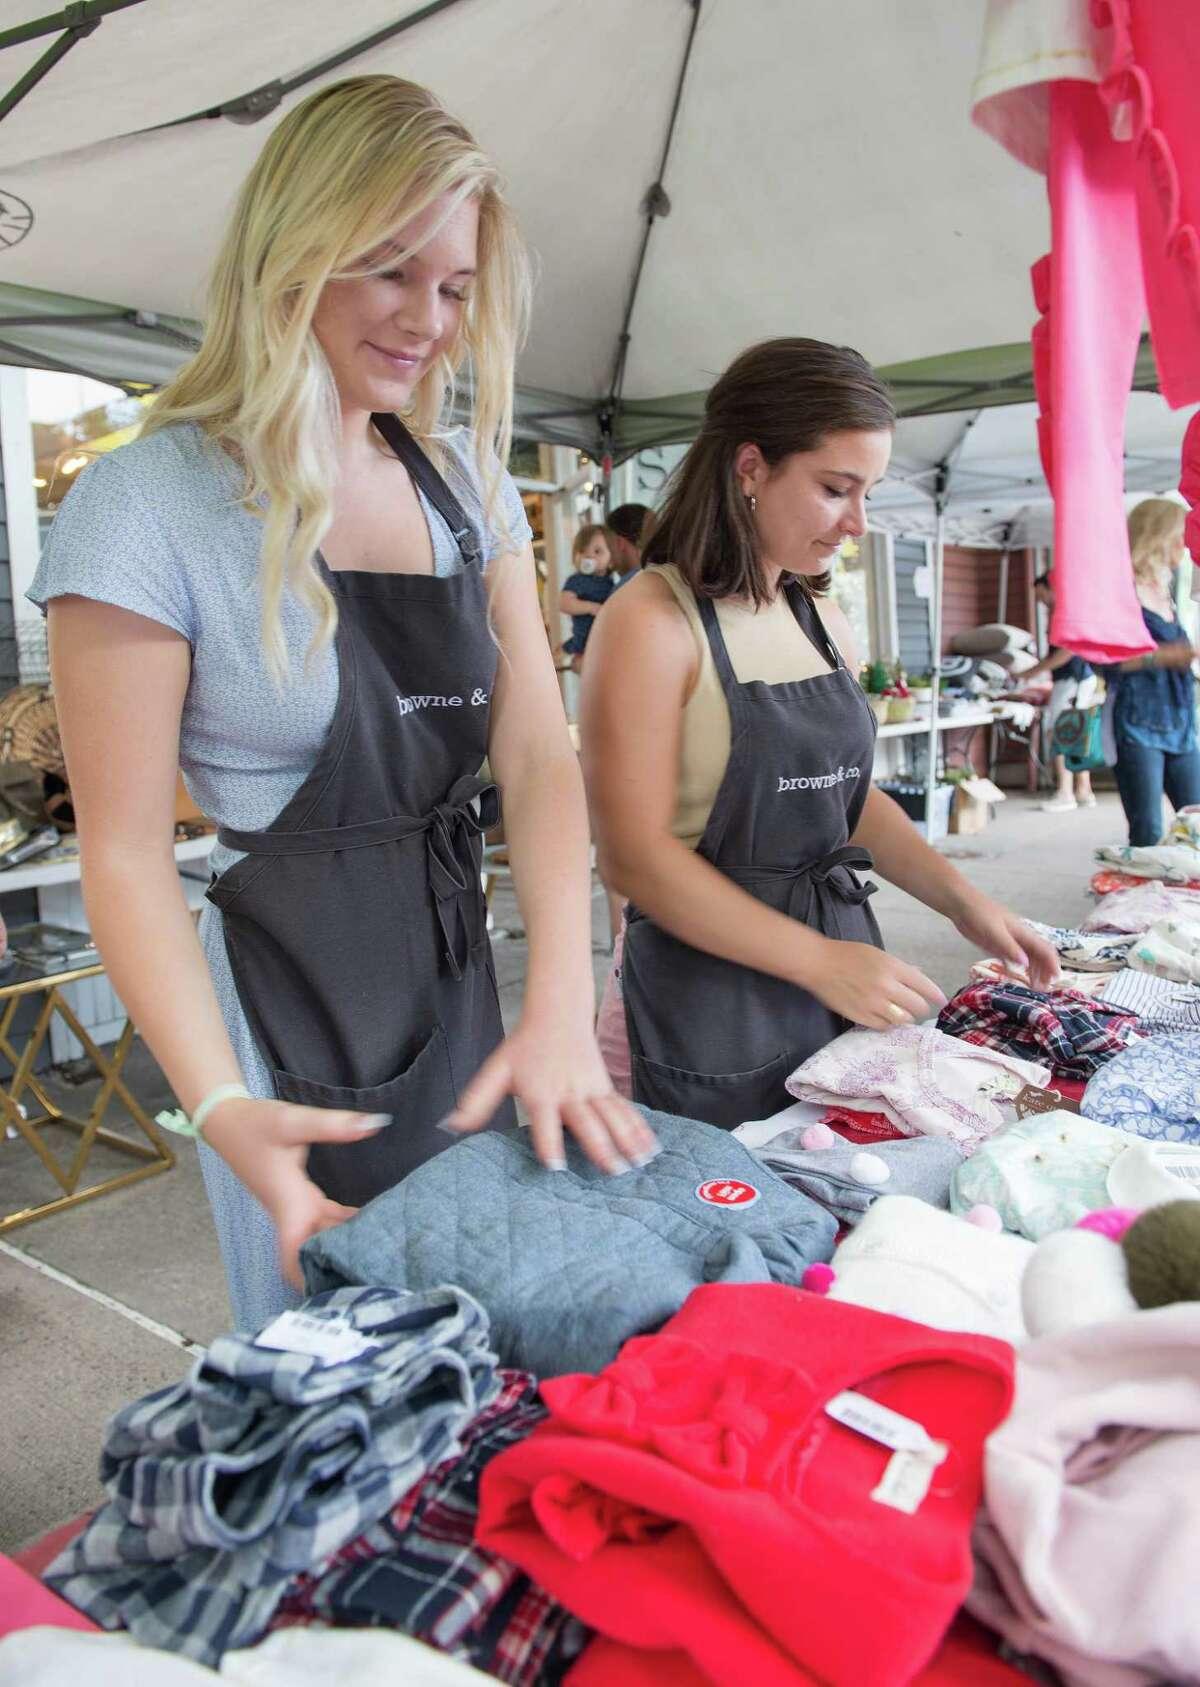 Graylin Gogolak and Katie Lashendock arrange shirts at Browne & Company at the Darien Sidewalk Sales on Friday, July 12, 2019 in Darien, Connecticut.